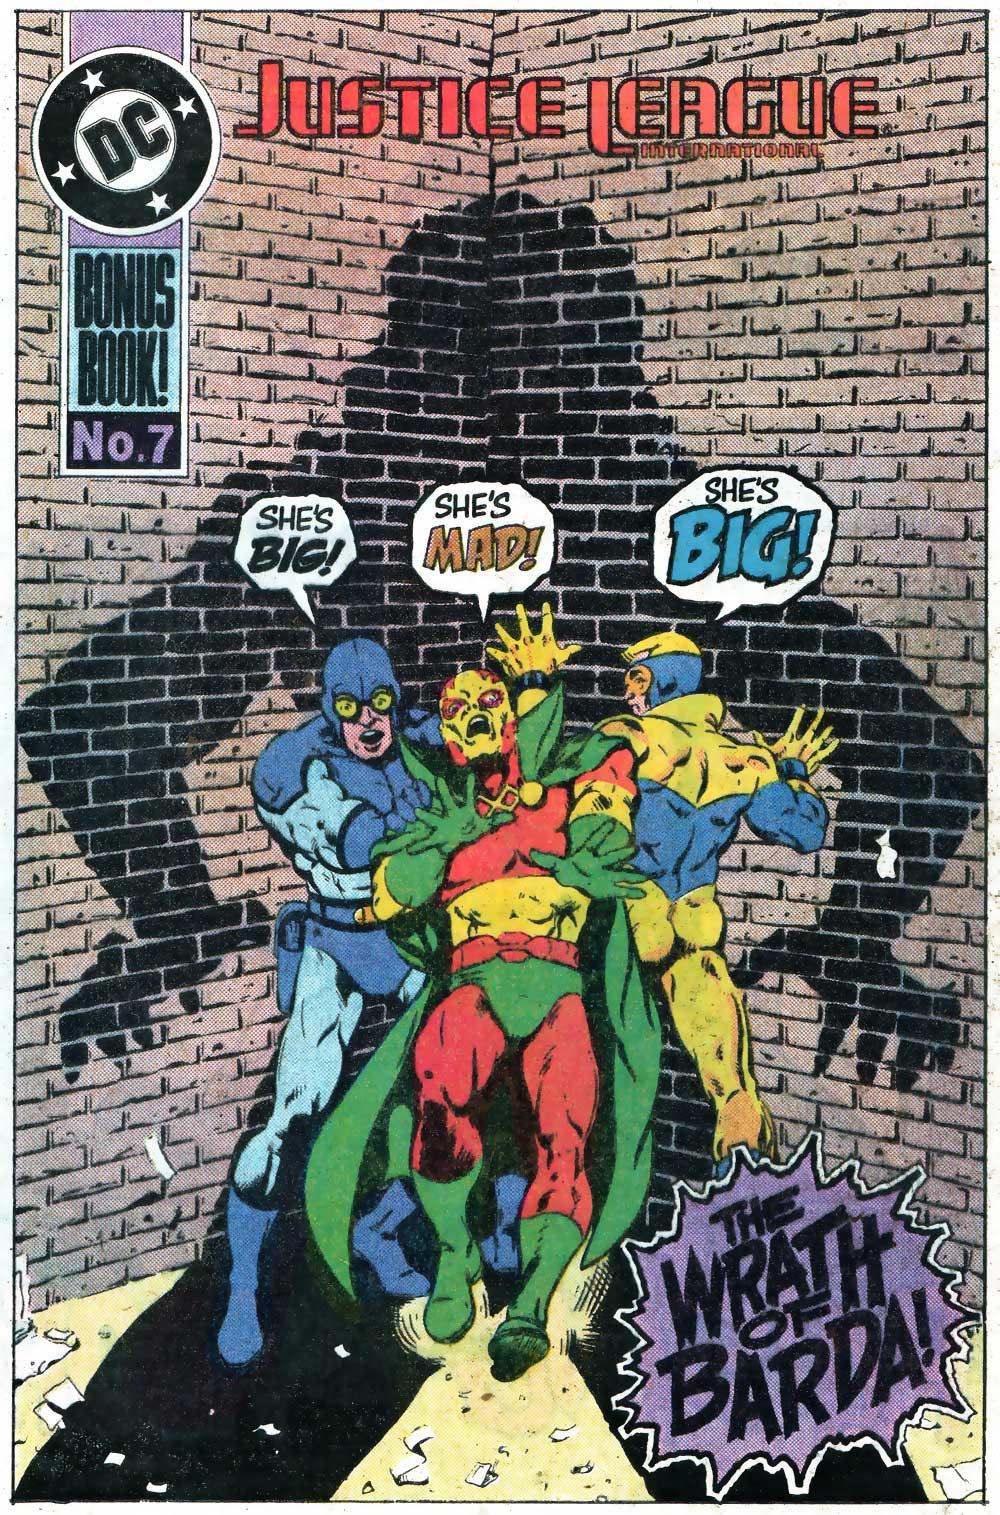 Justice League International #18 Bonus Book - Raising the Roof